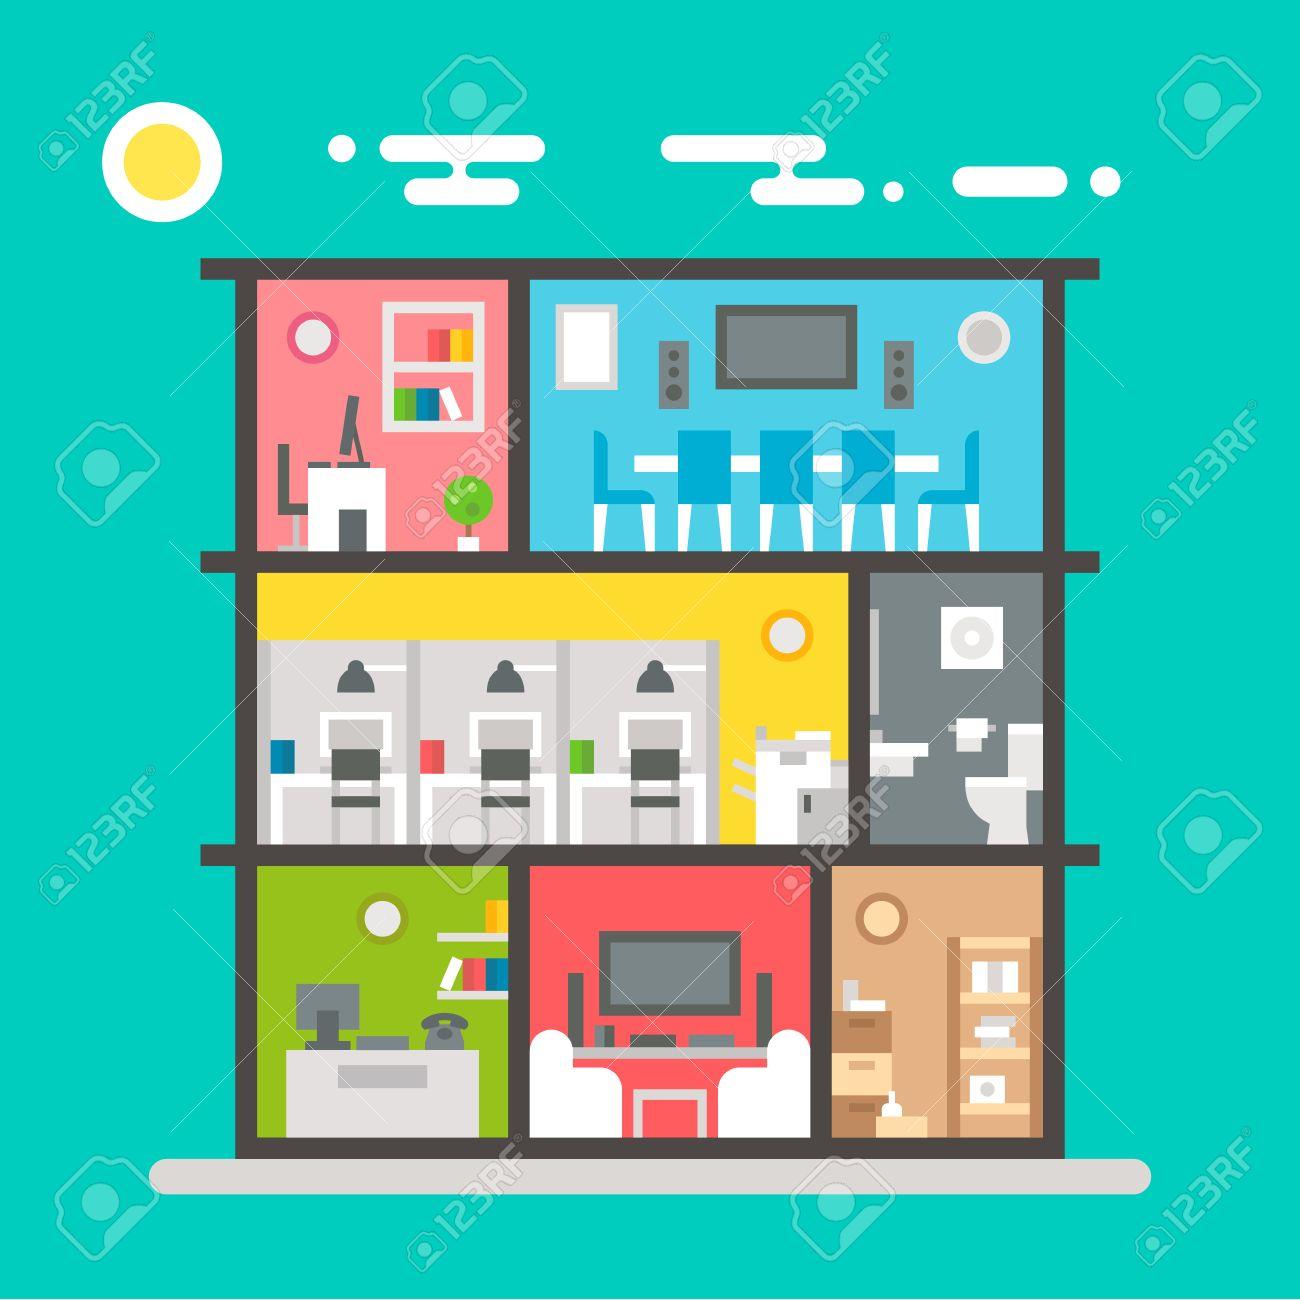 Flat Design Of Office Interior Illustration Vector Royalty Free